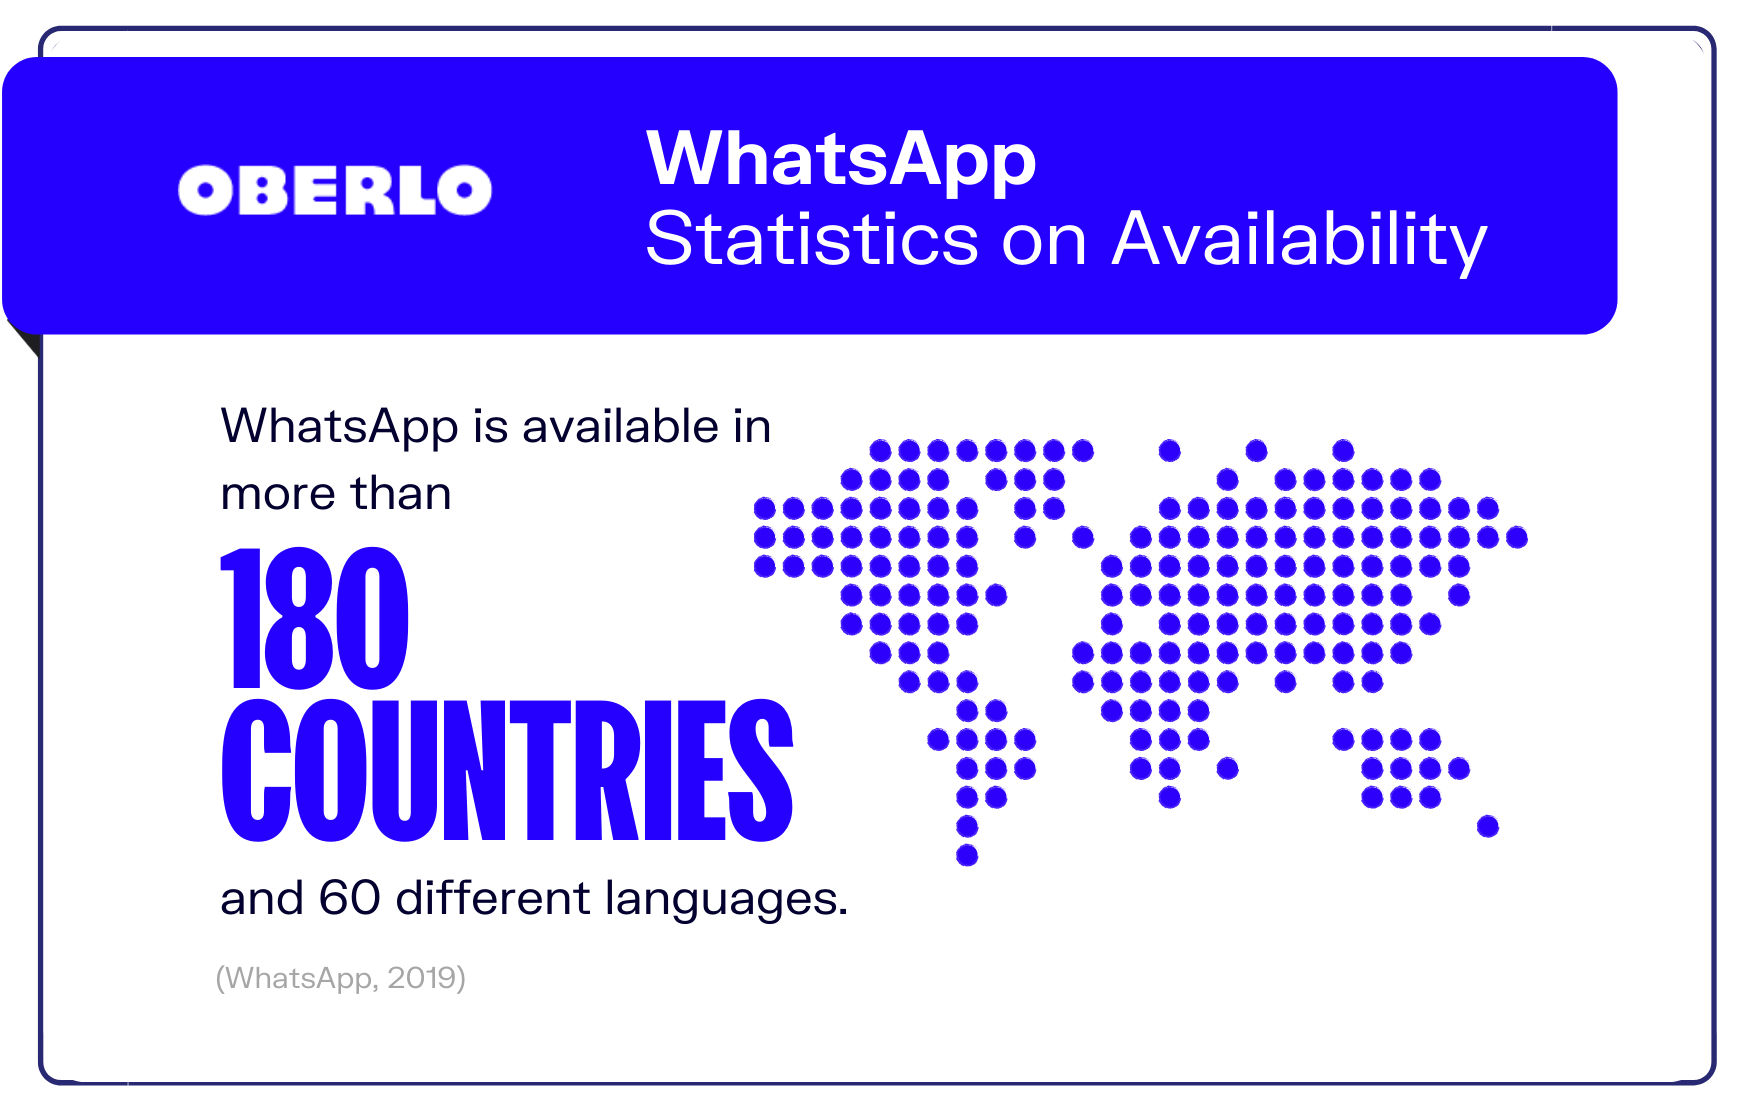 graphic of whatsapp statistic #4